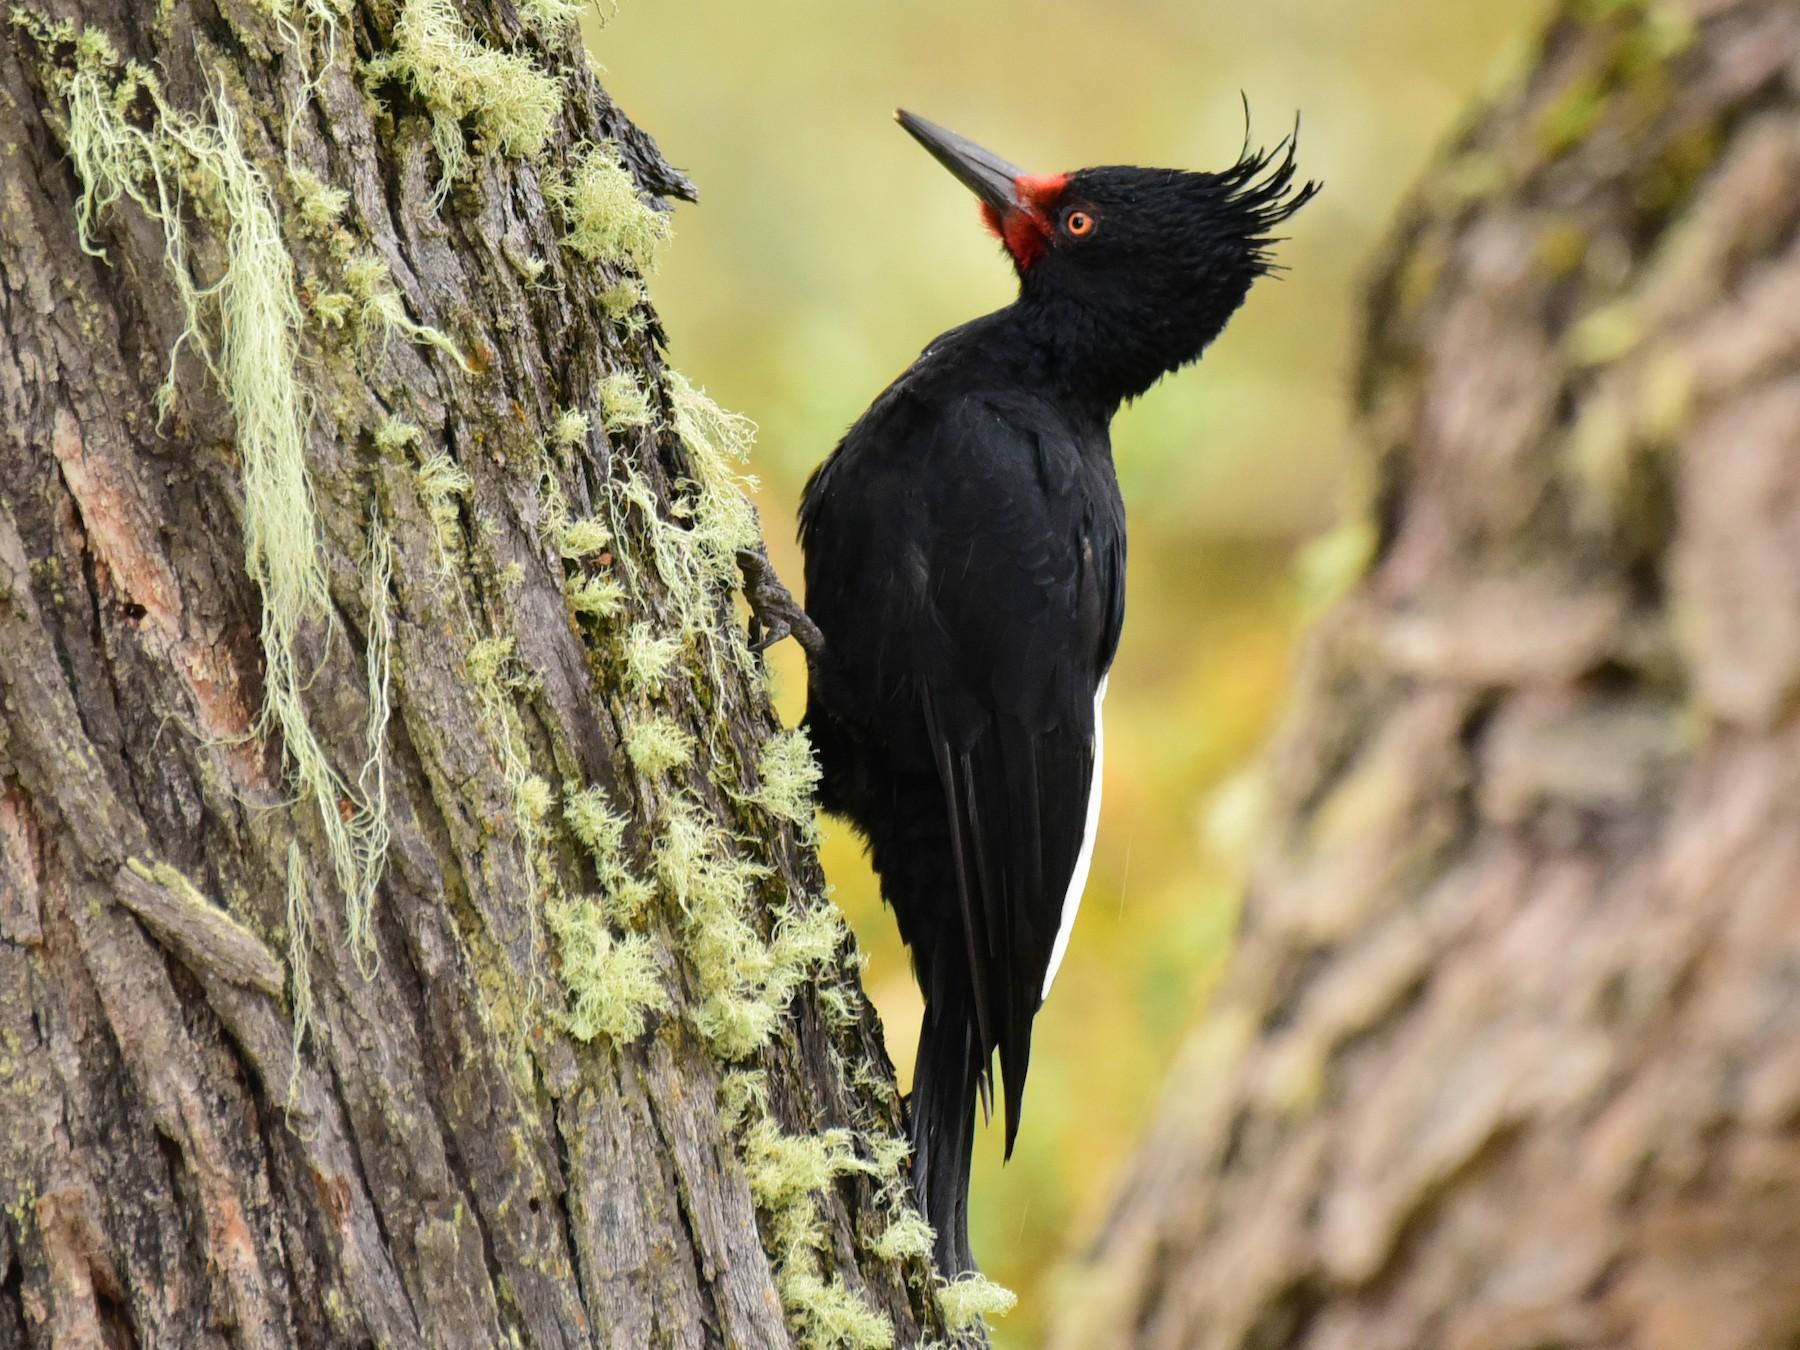 Magellanic Woodpecker - Luiz Moschini